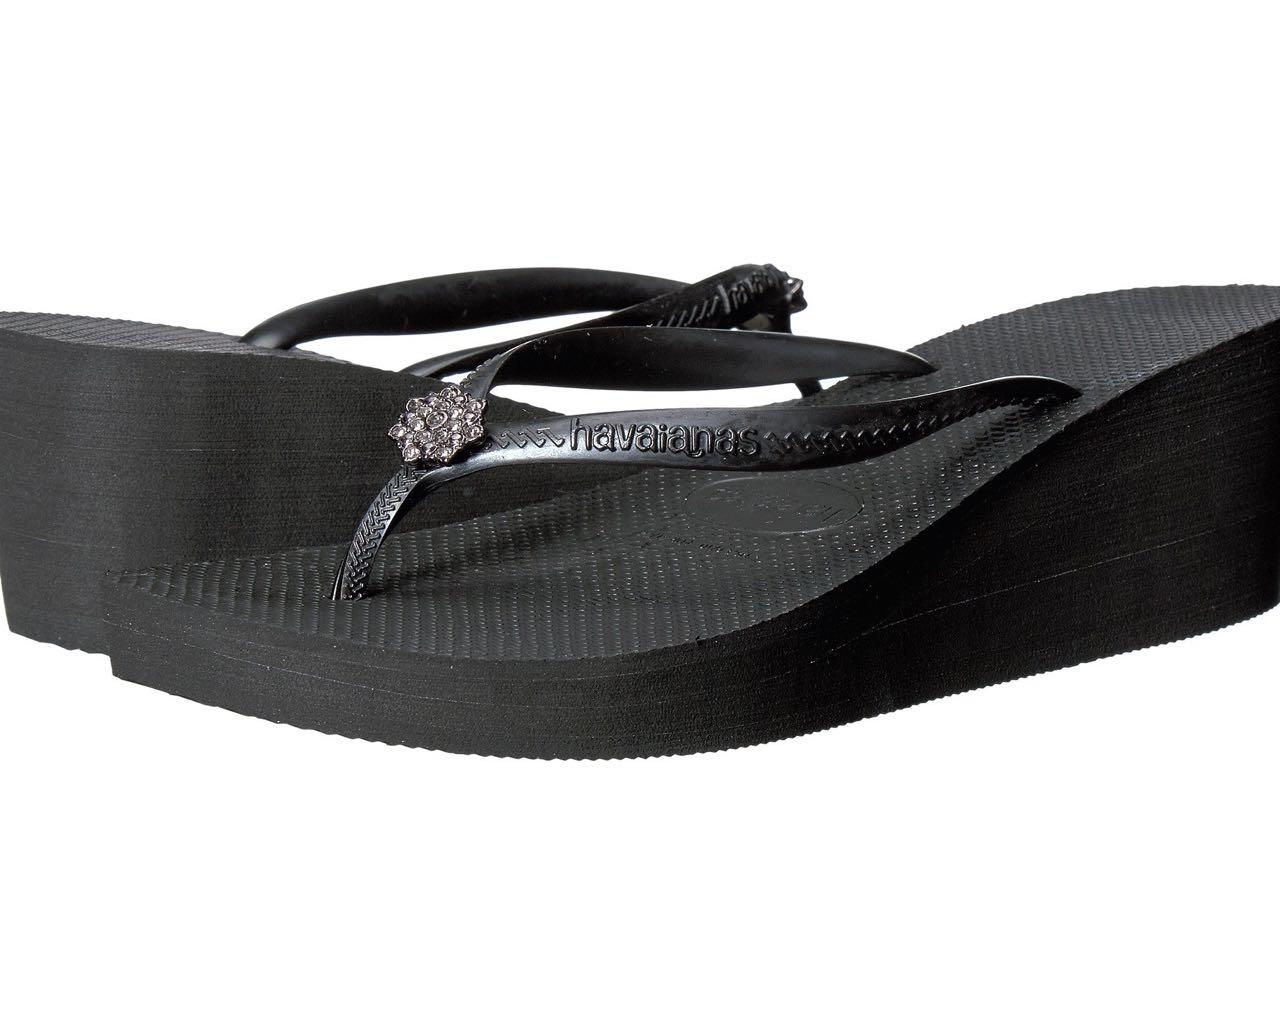 f34bc84c3abe92 Havaianas Wedge Flip Flops High Fashion POEM Black